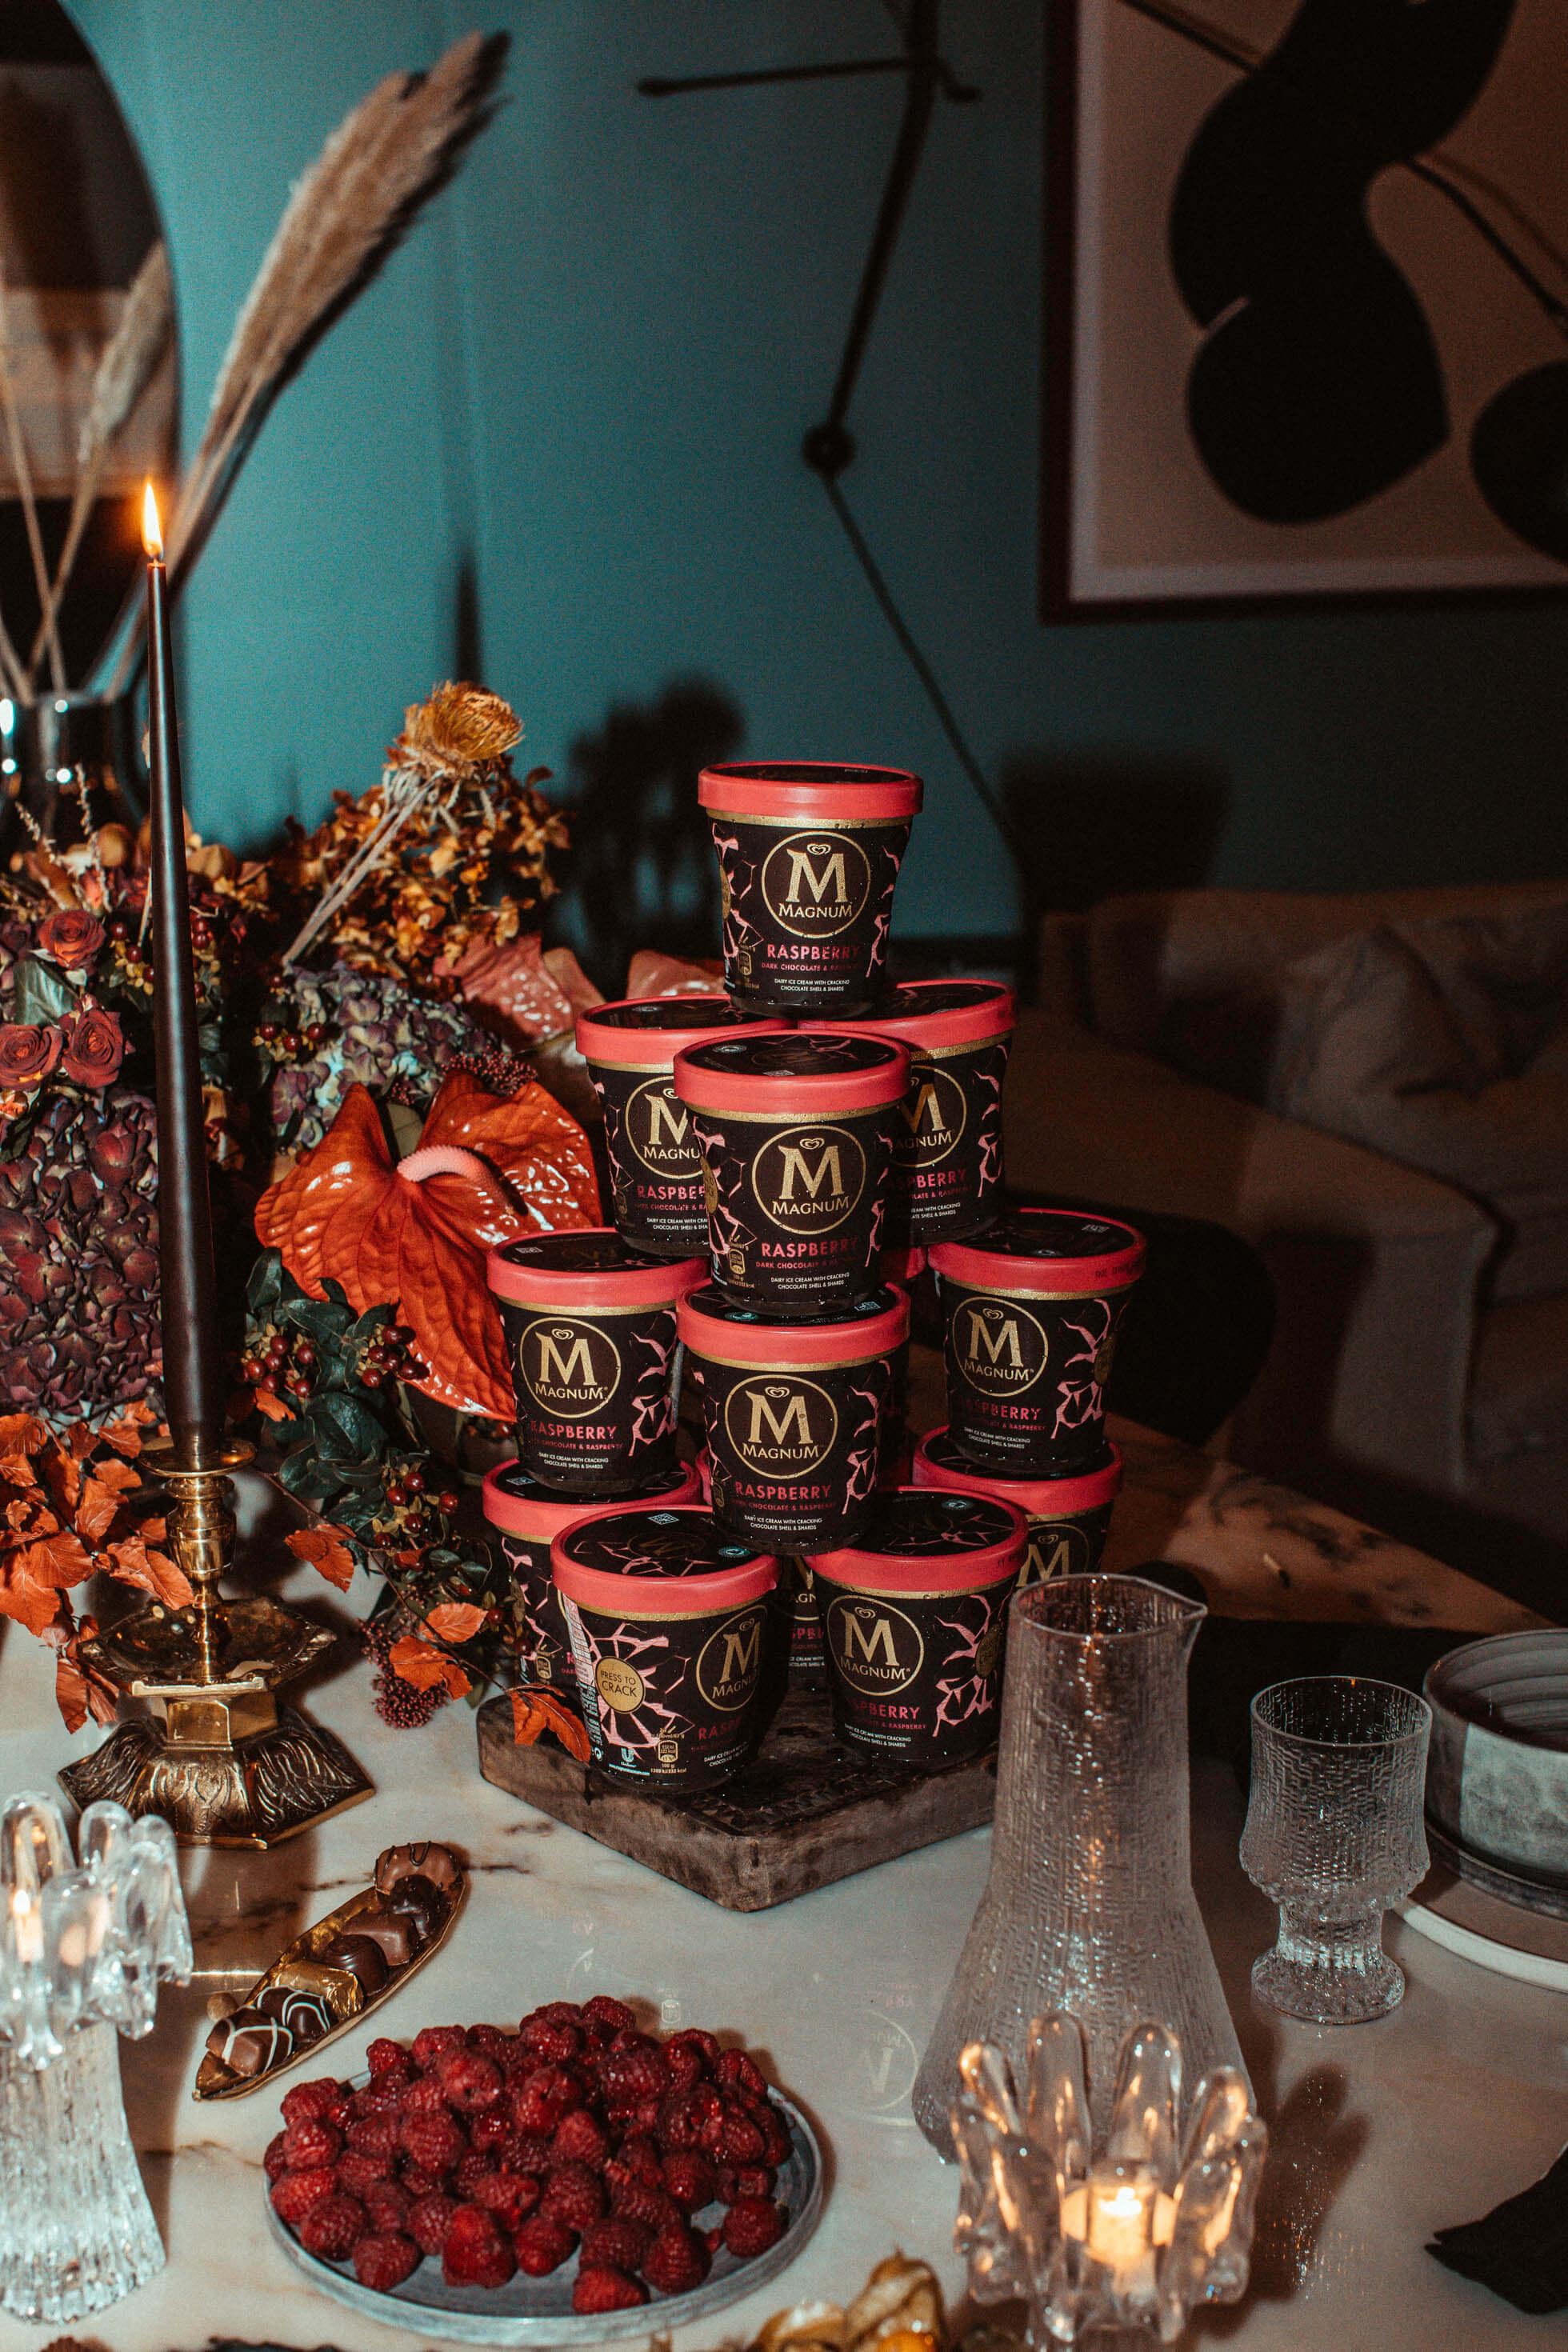 Magnum Chocolate & Hazelnut Praliné